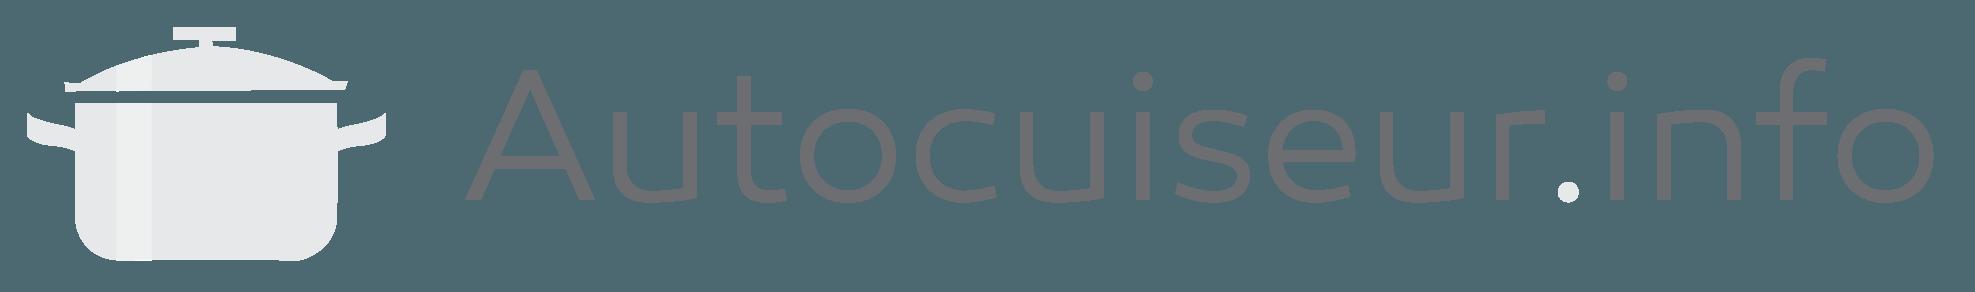 Autocuiseur.info